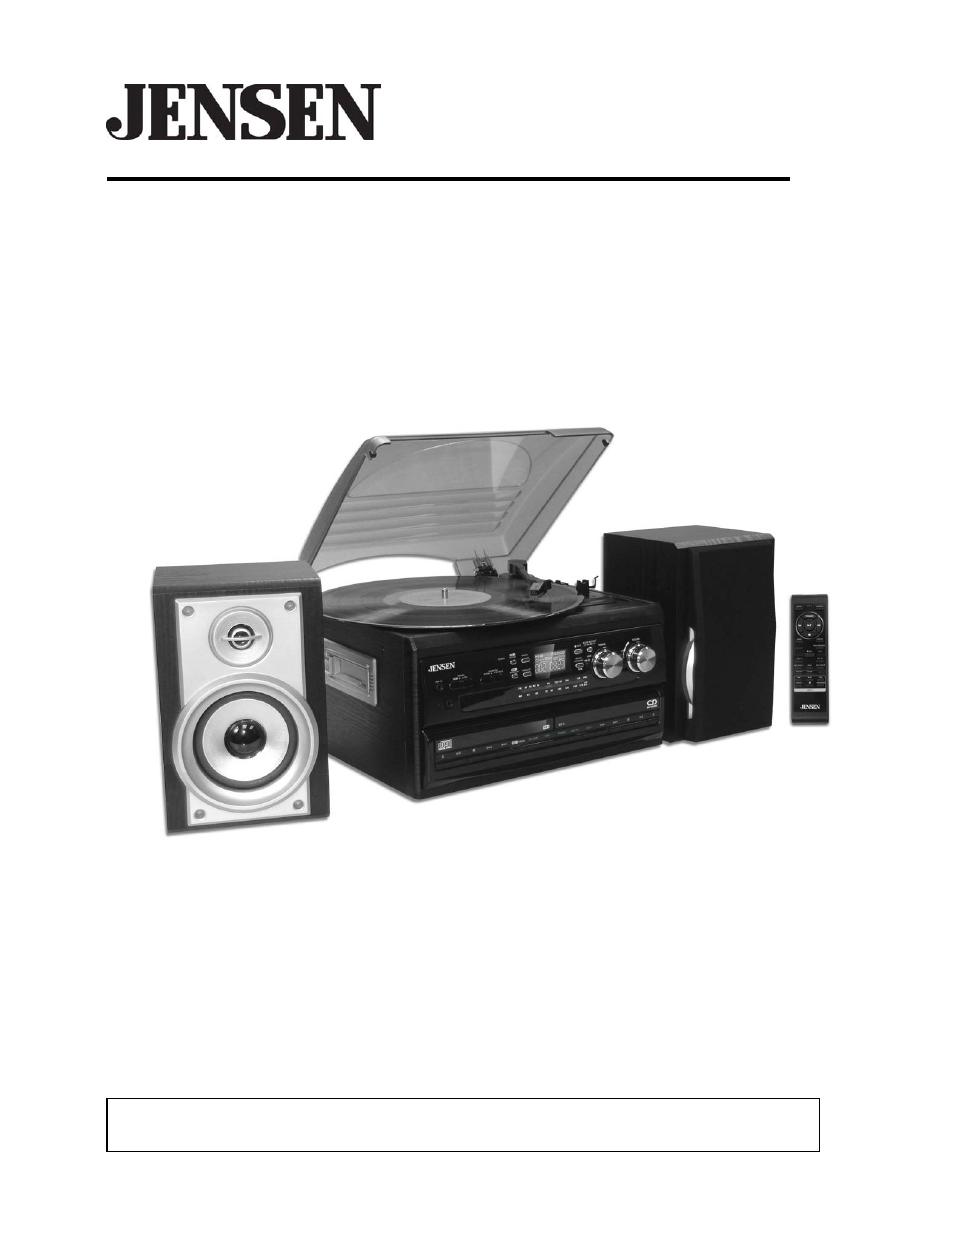 jensen jta 980 user manual 24 pages rh manualsdir com jensen cd-490 sport stereo cd player manual jensen cd-490 sport stereo cd player manual